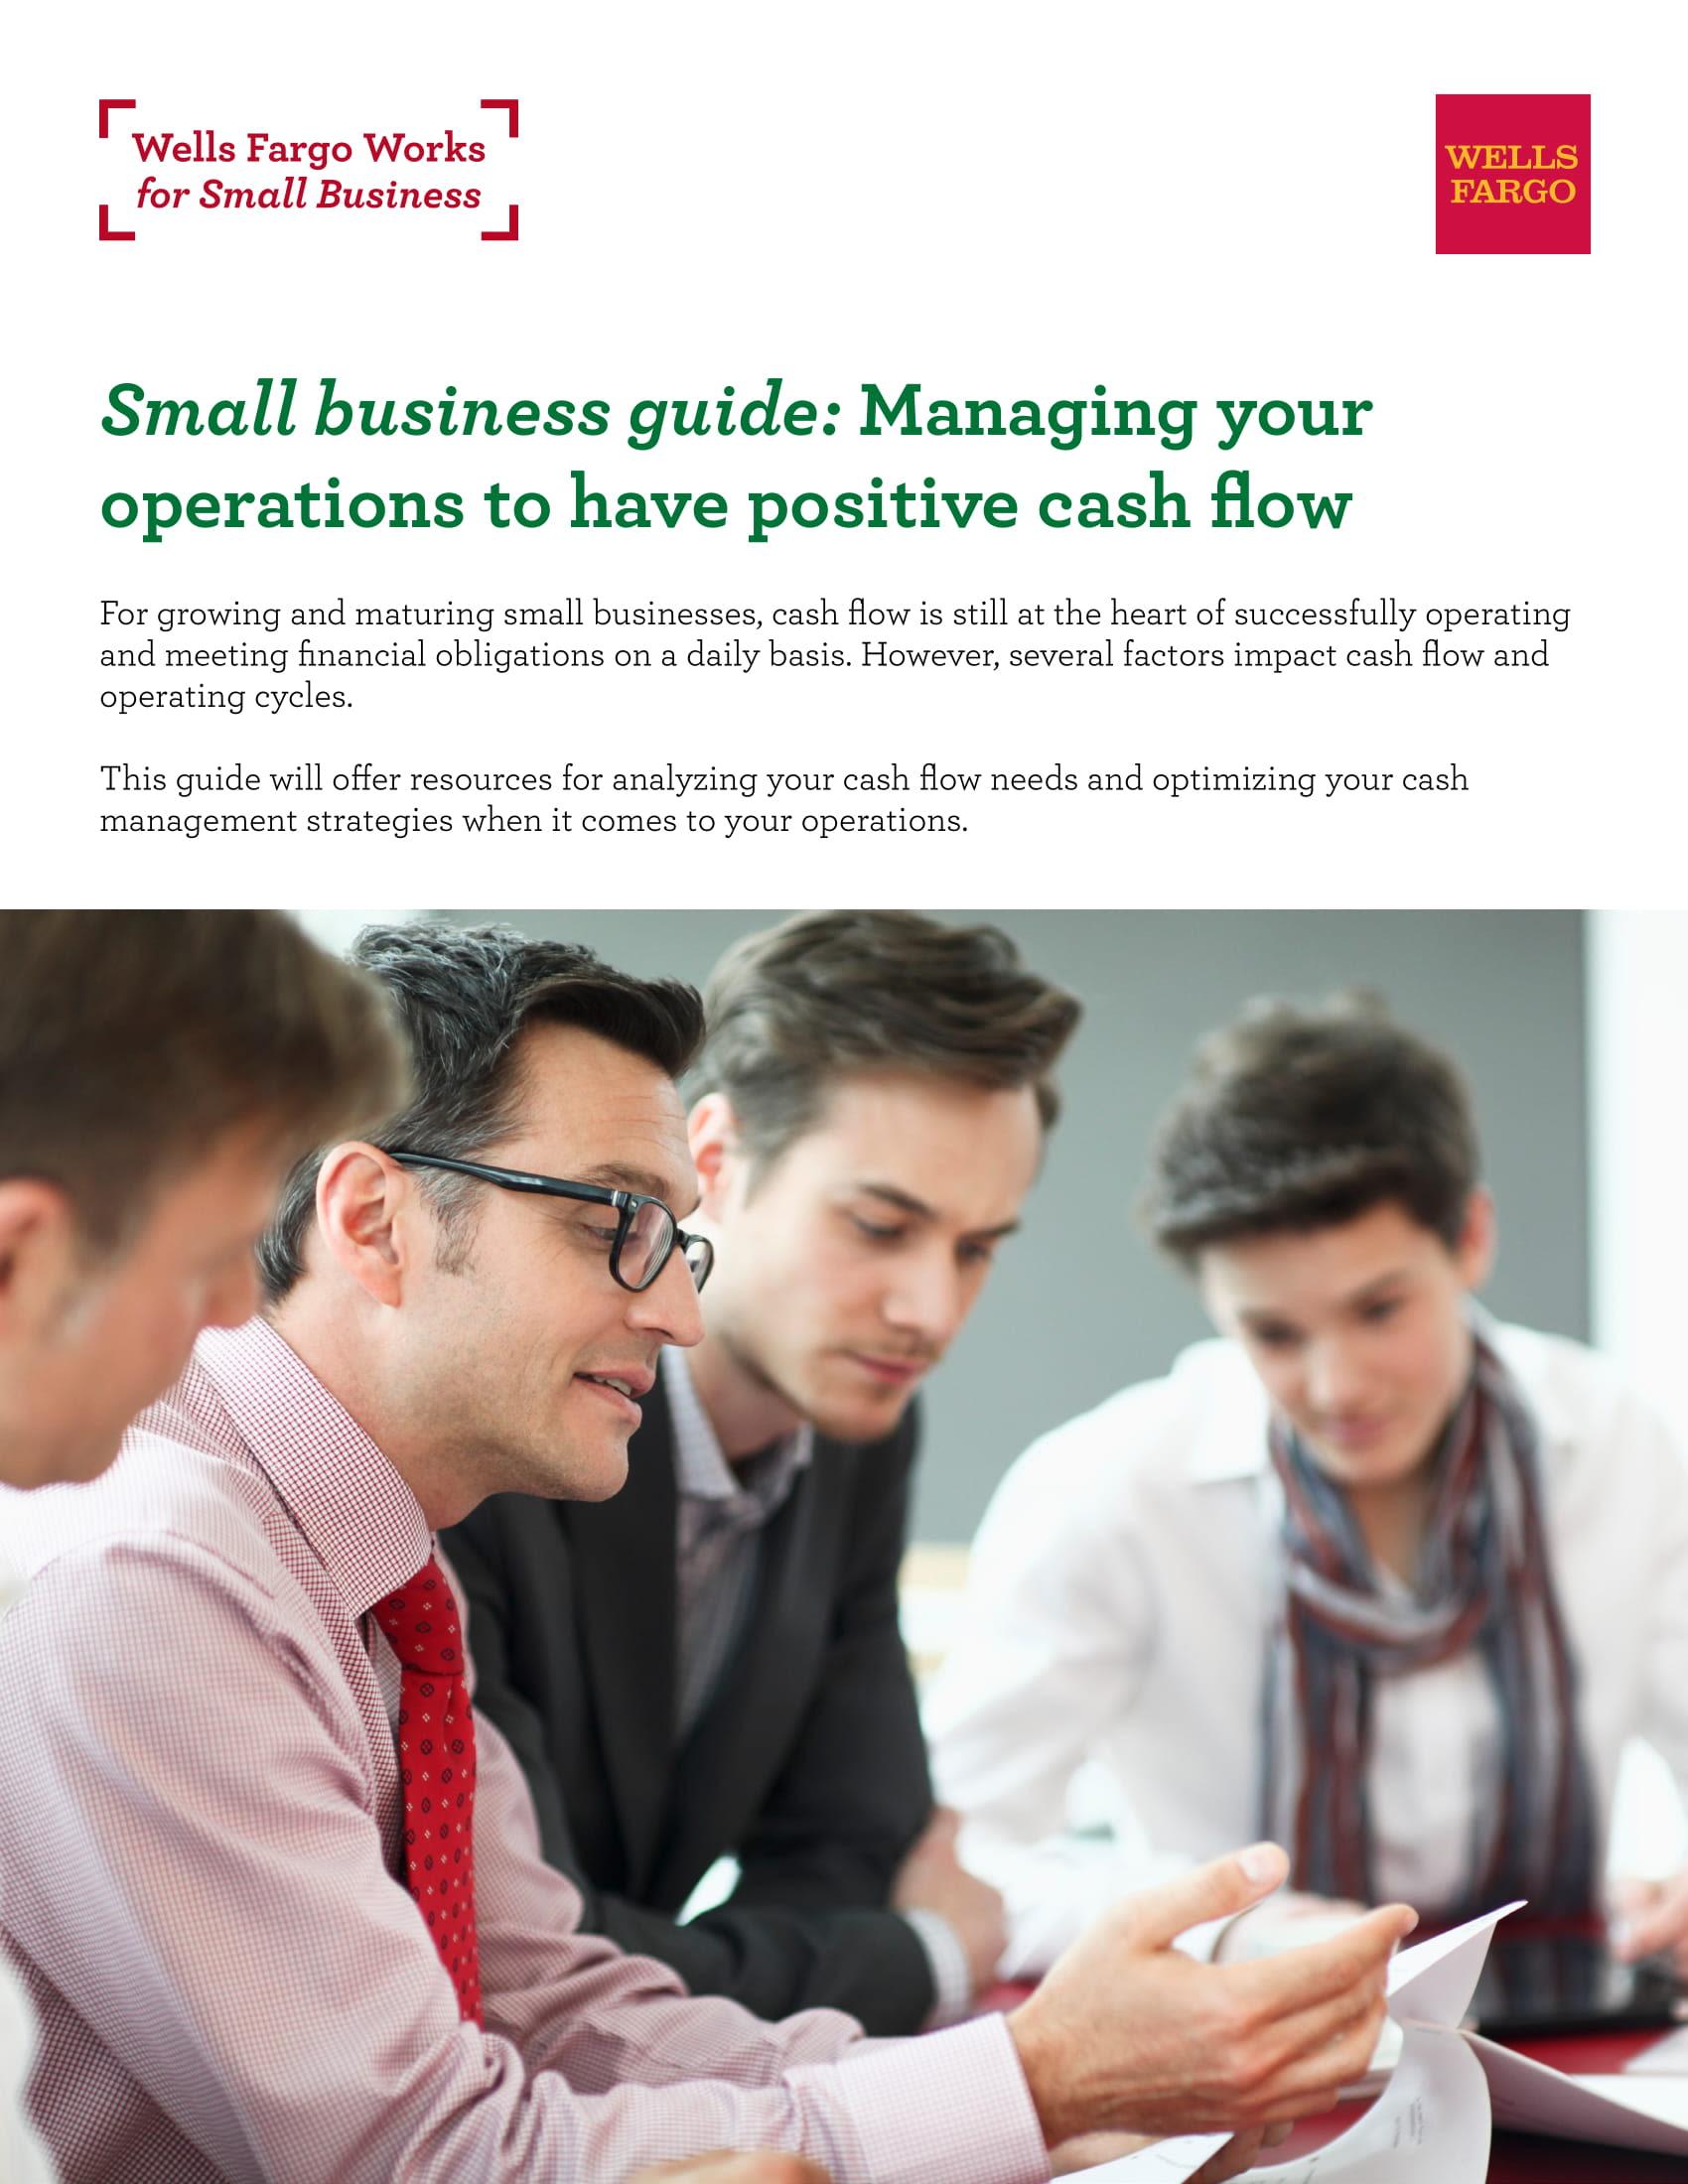 Improve Operations for Positive Cash Flow | Wells Fargo